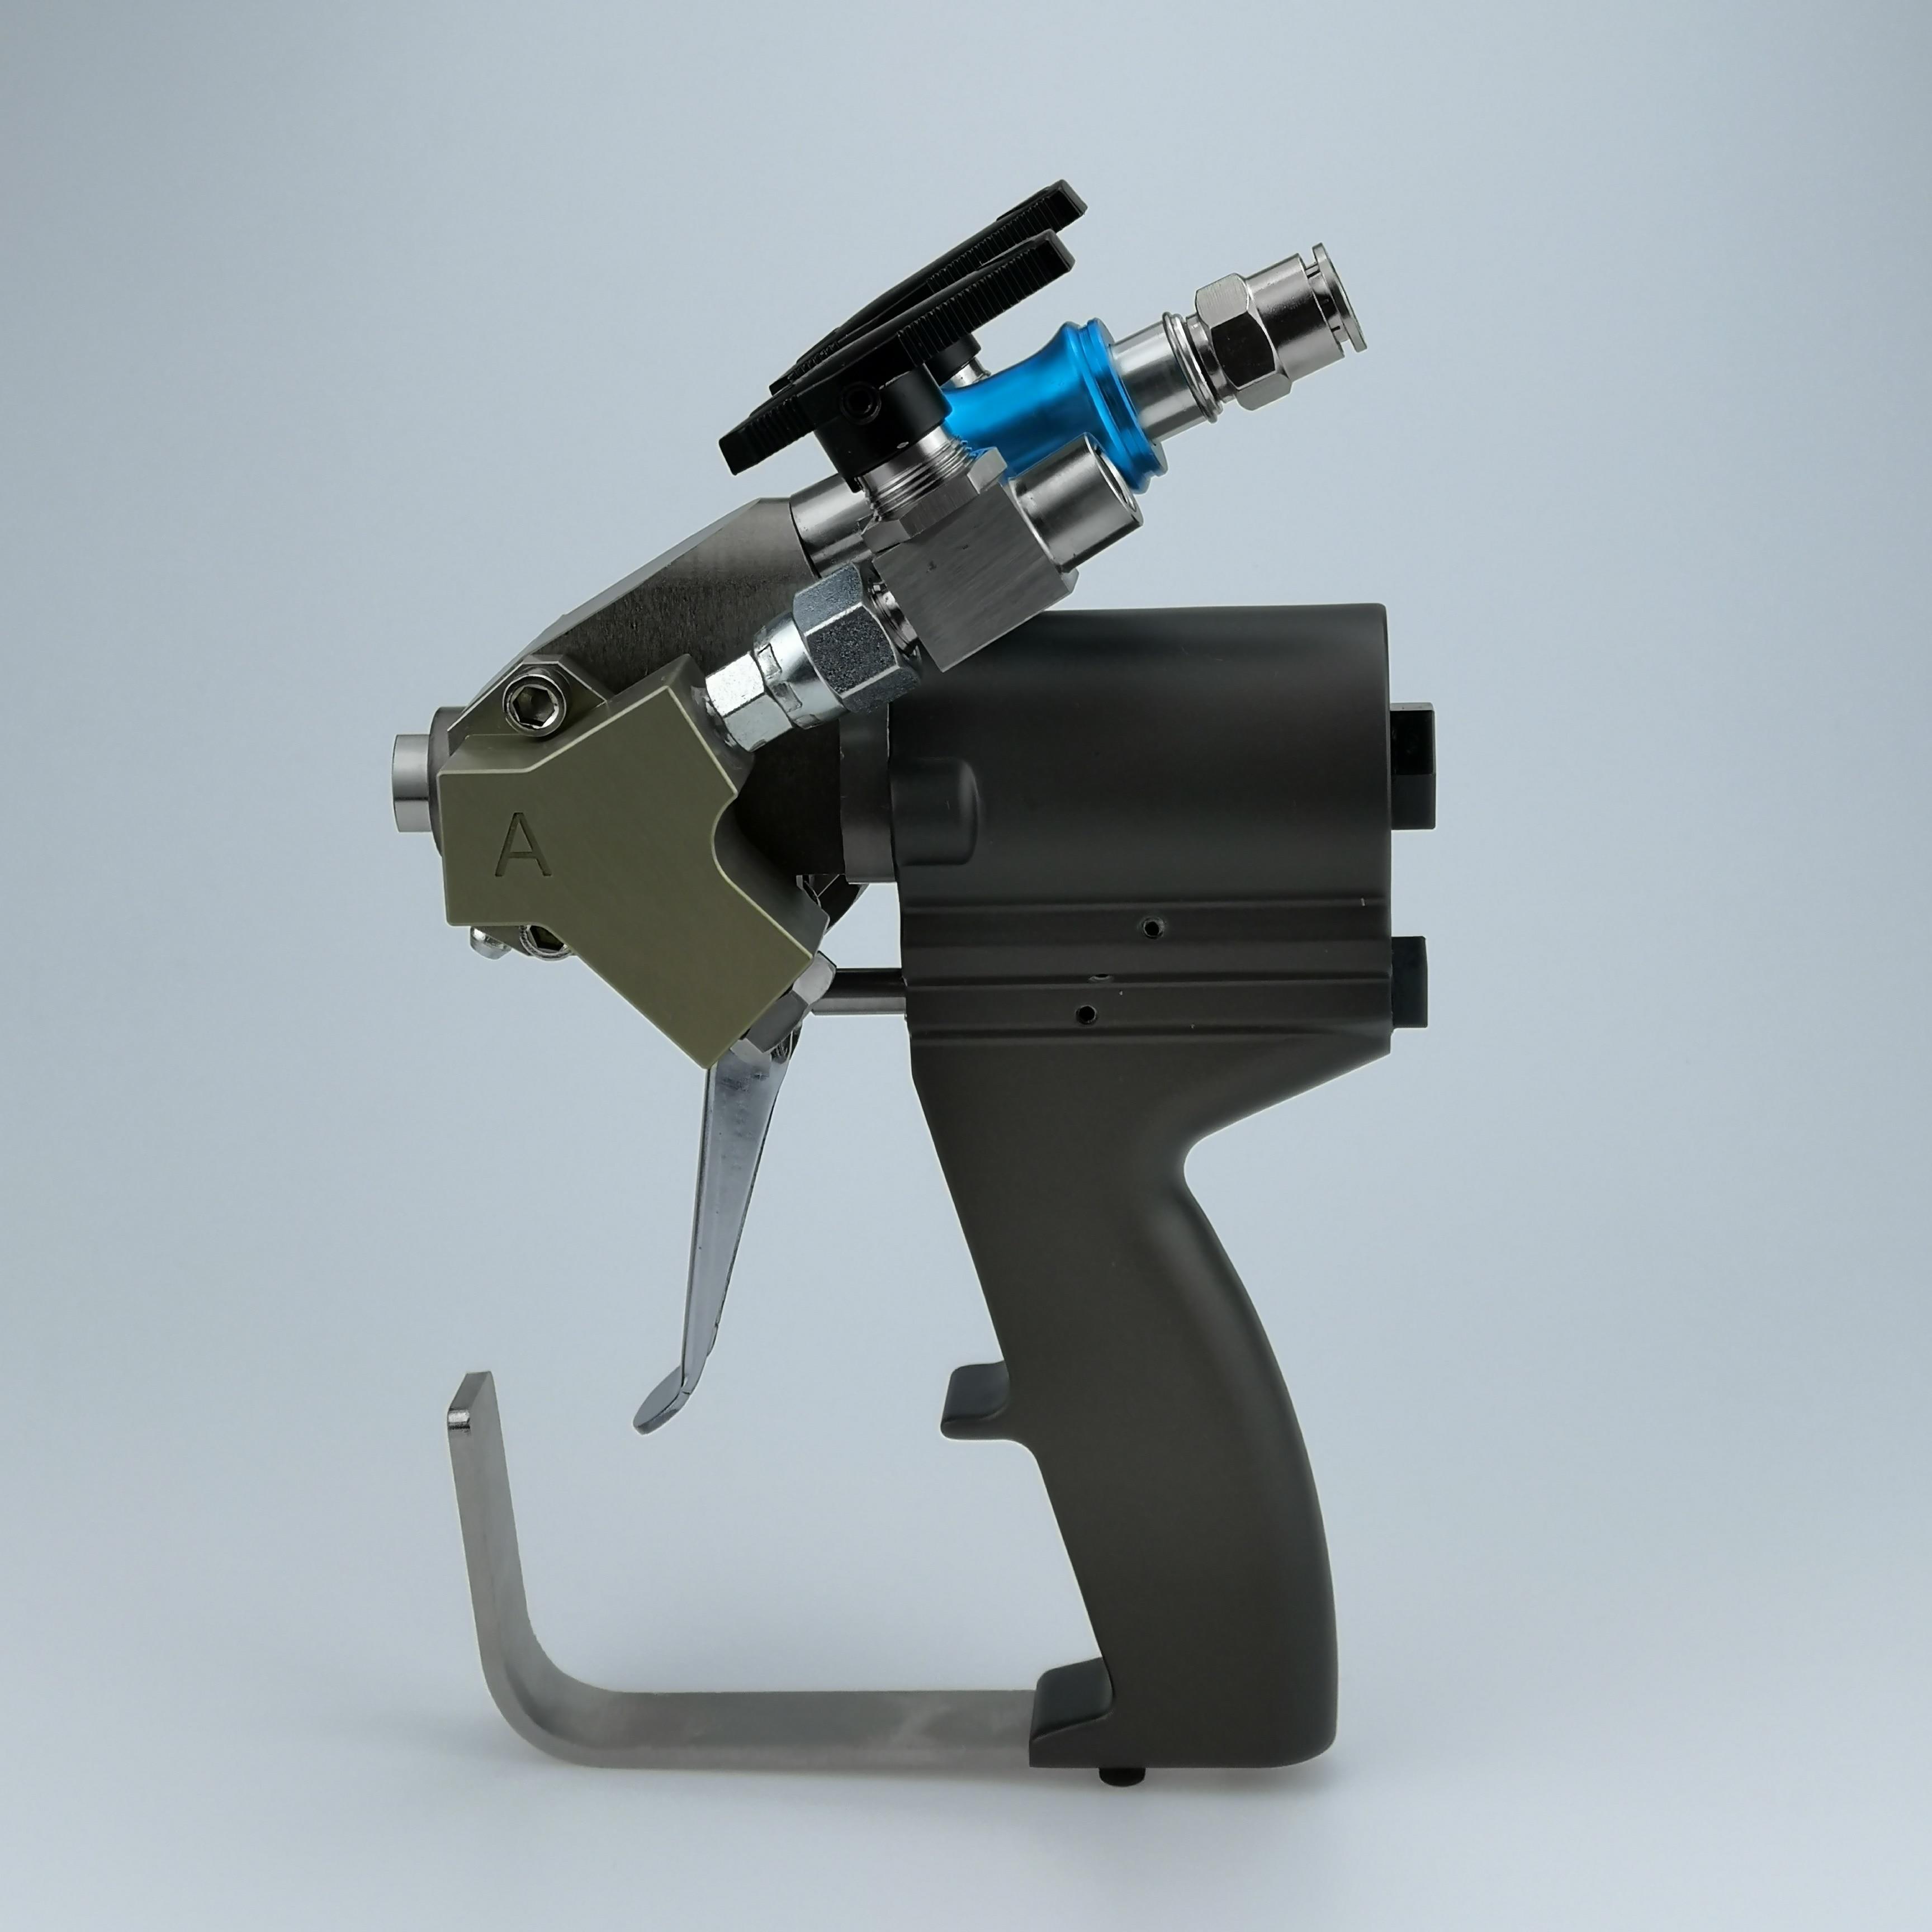 P2 spray foam gun for spray polyurethane foam insulation GOOD QUALITY PRICE